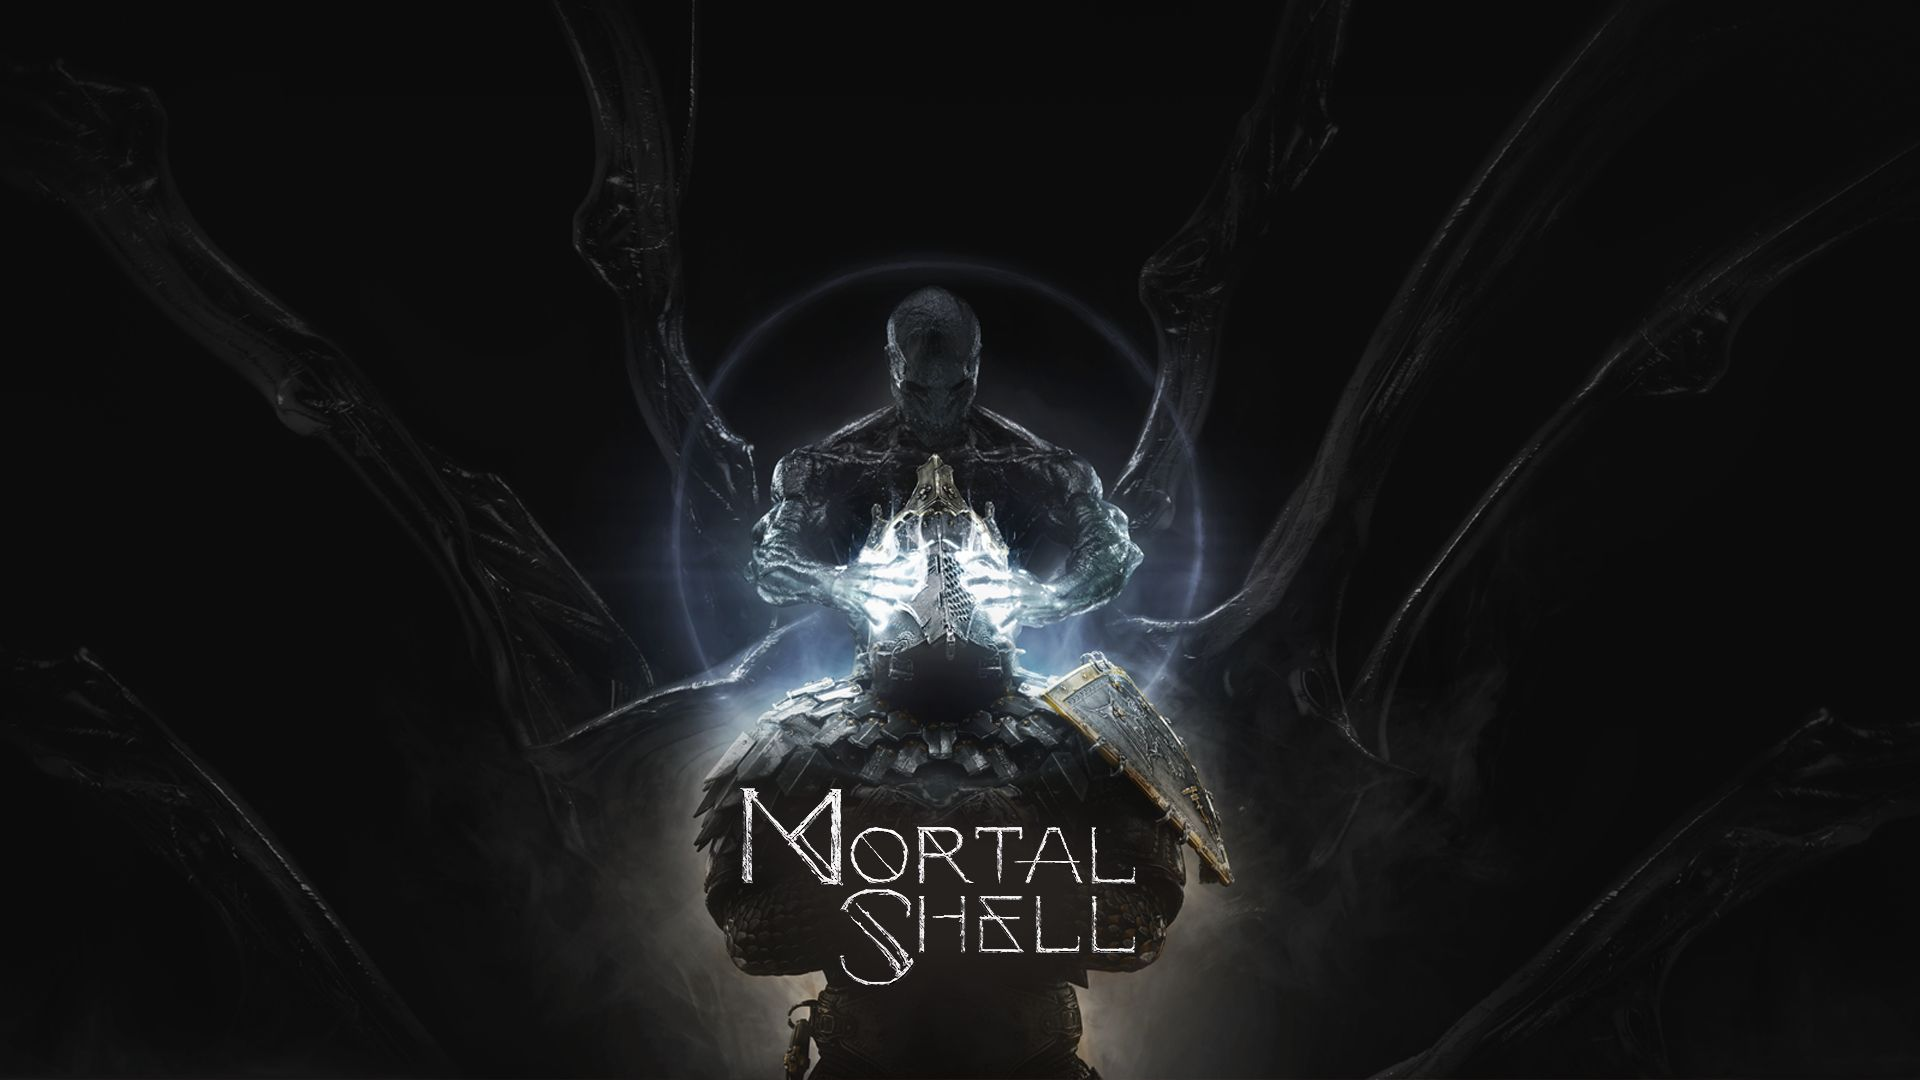 Mortal Shell - PS4 - Wallpapers - 1920x1080